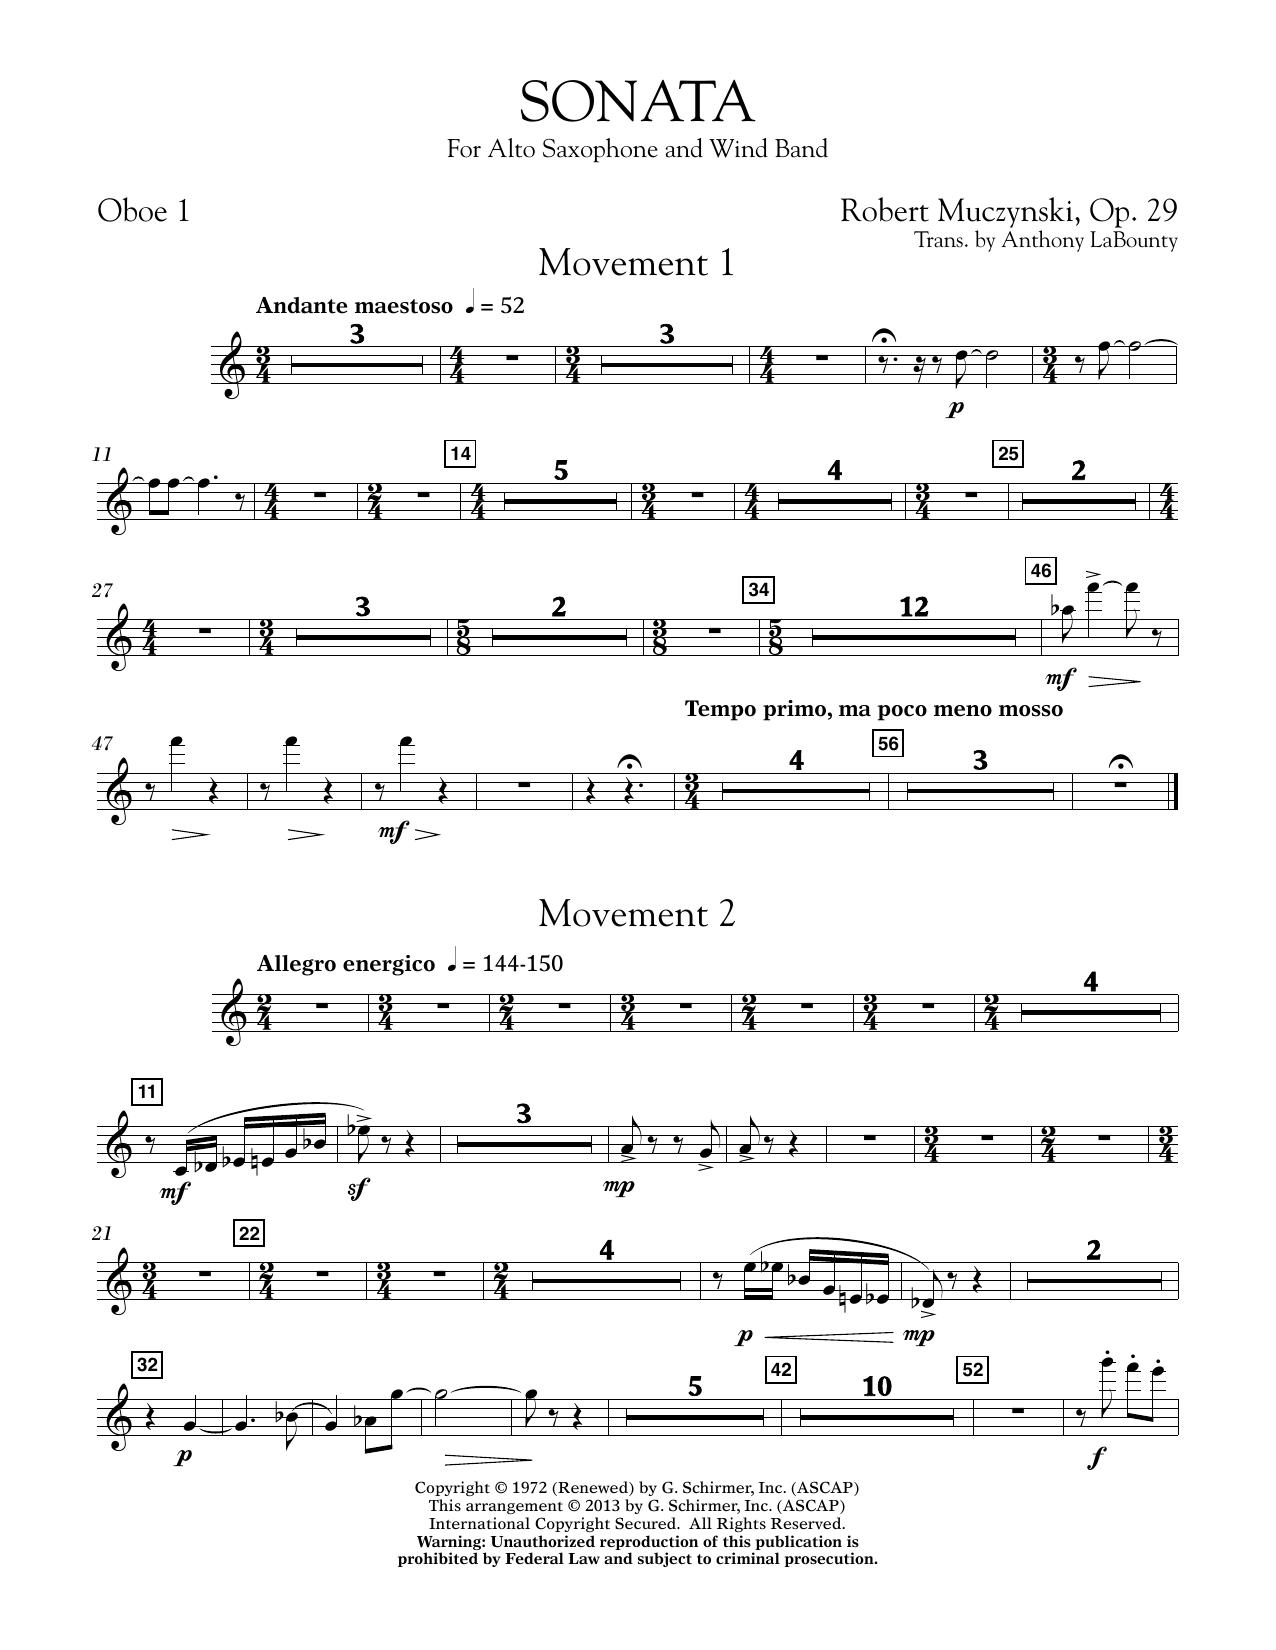 Sonata for Alto Saxophone, Op. 29 - Oboe 1 (Concert Band)